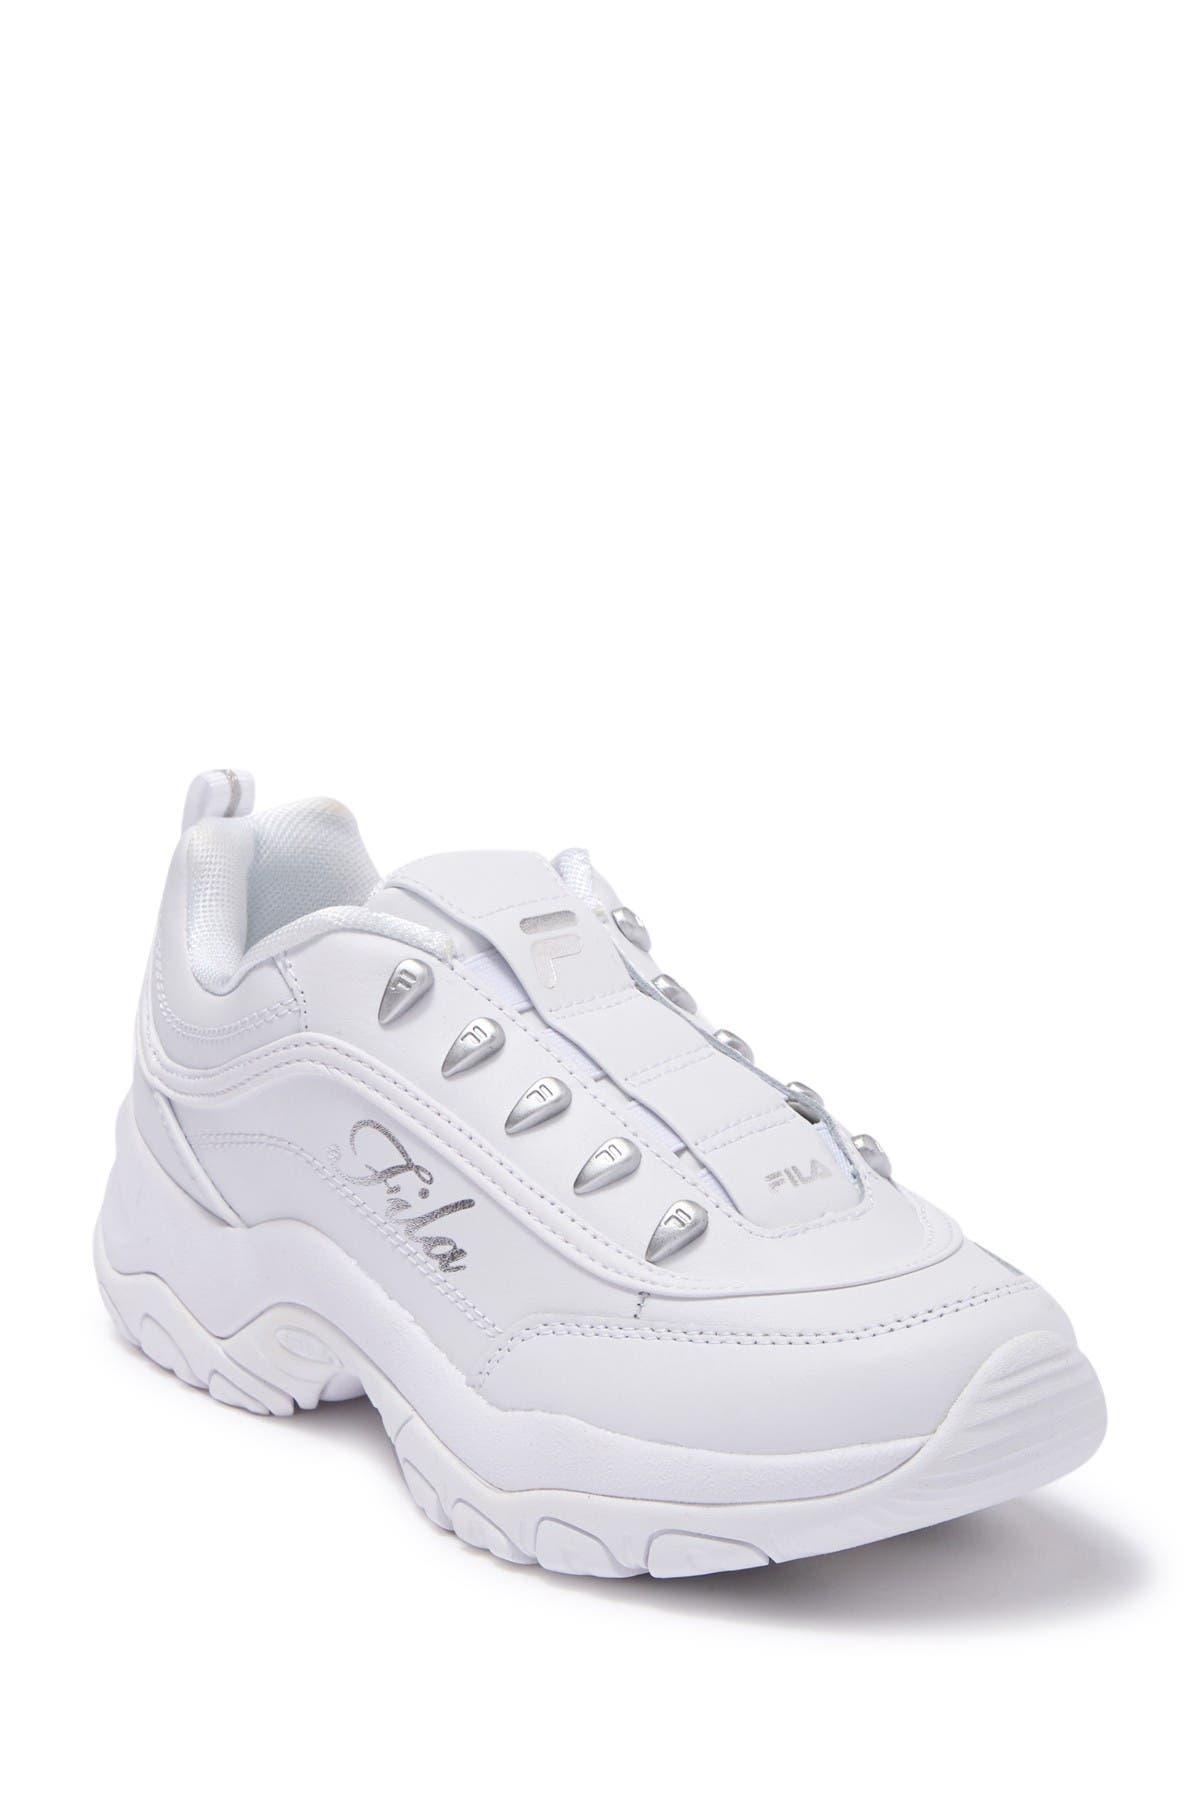 FILA USA   Strada G Slip-On Sneaker